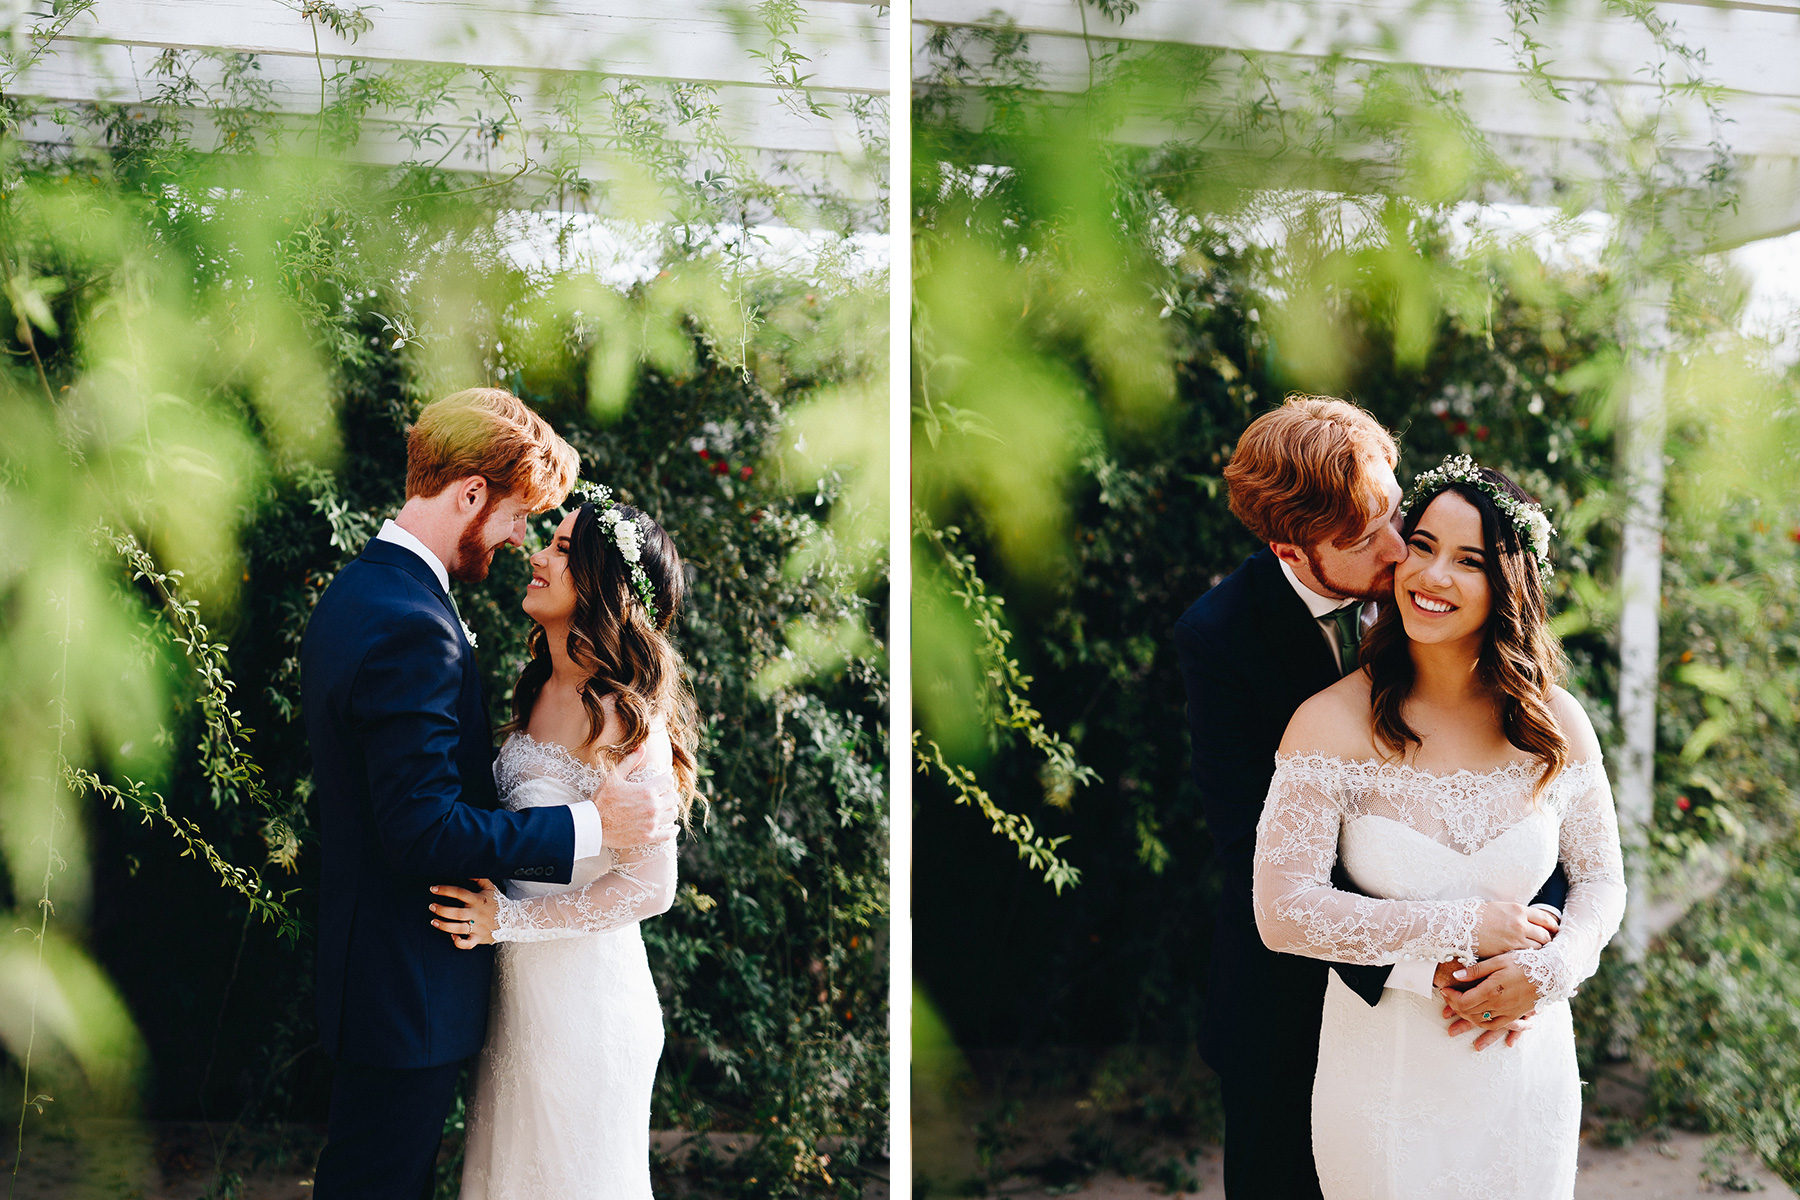 181104-Luxium-Weddings-Arizona-@matt__Le-Brandon-Kariana-Phoenix-Valley-Garden-Center-1114a.jpg